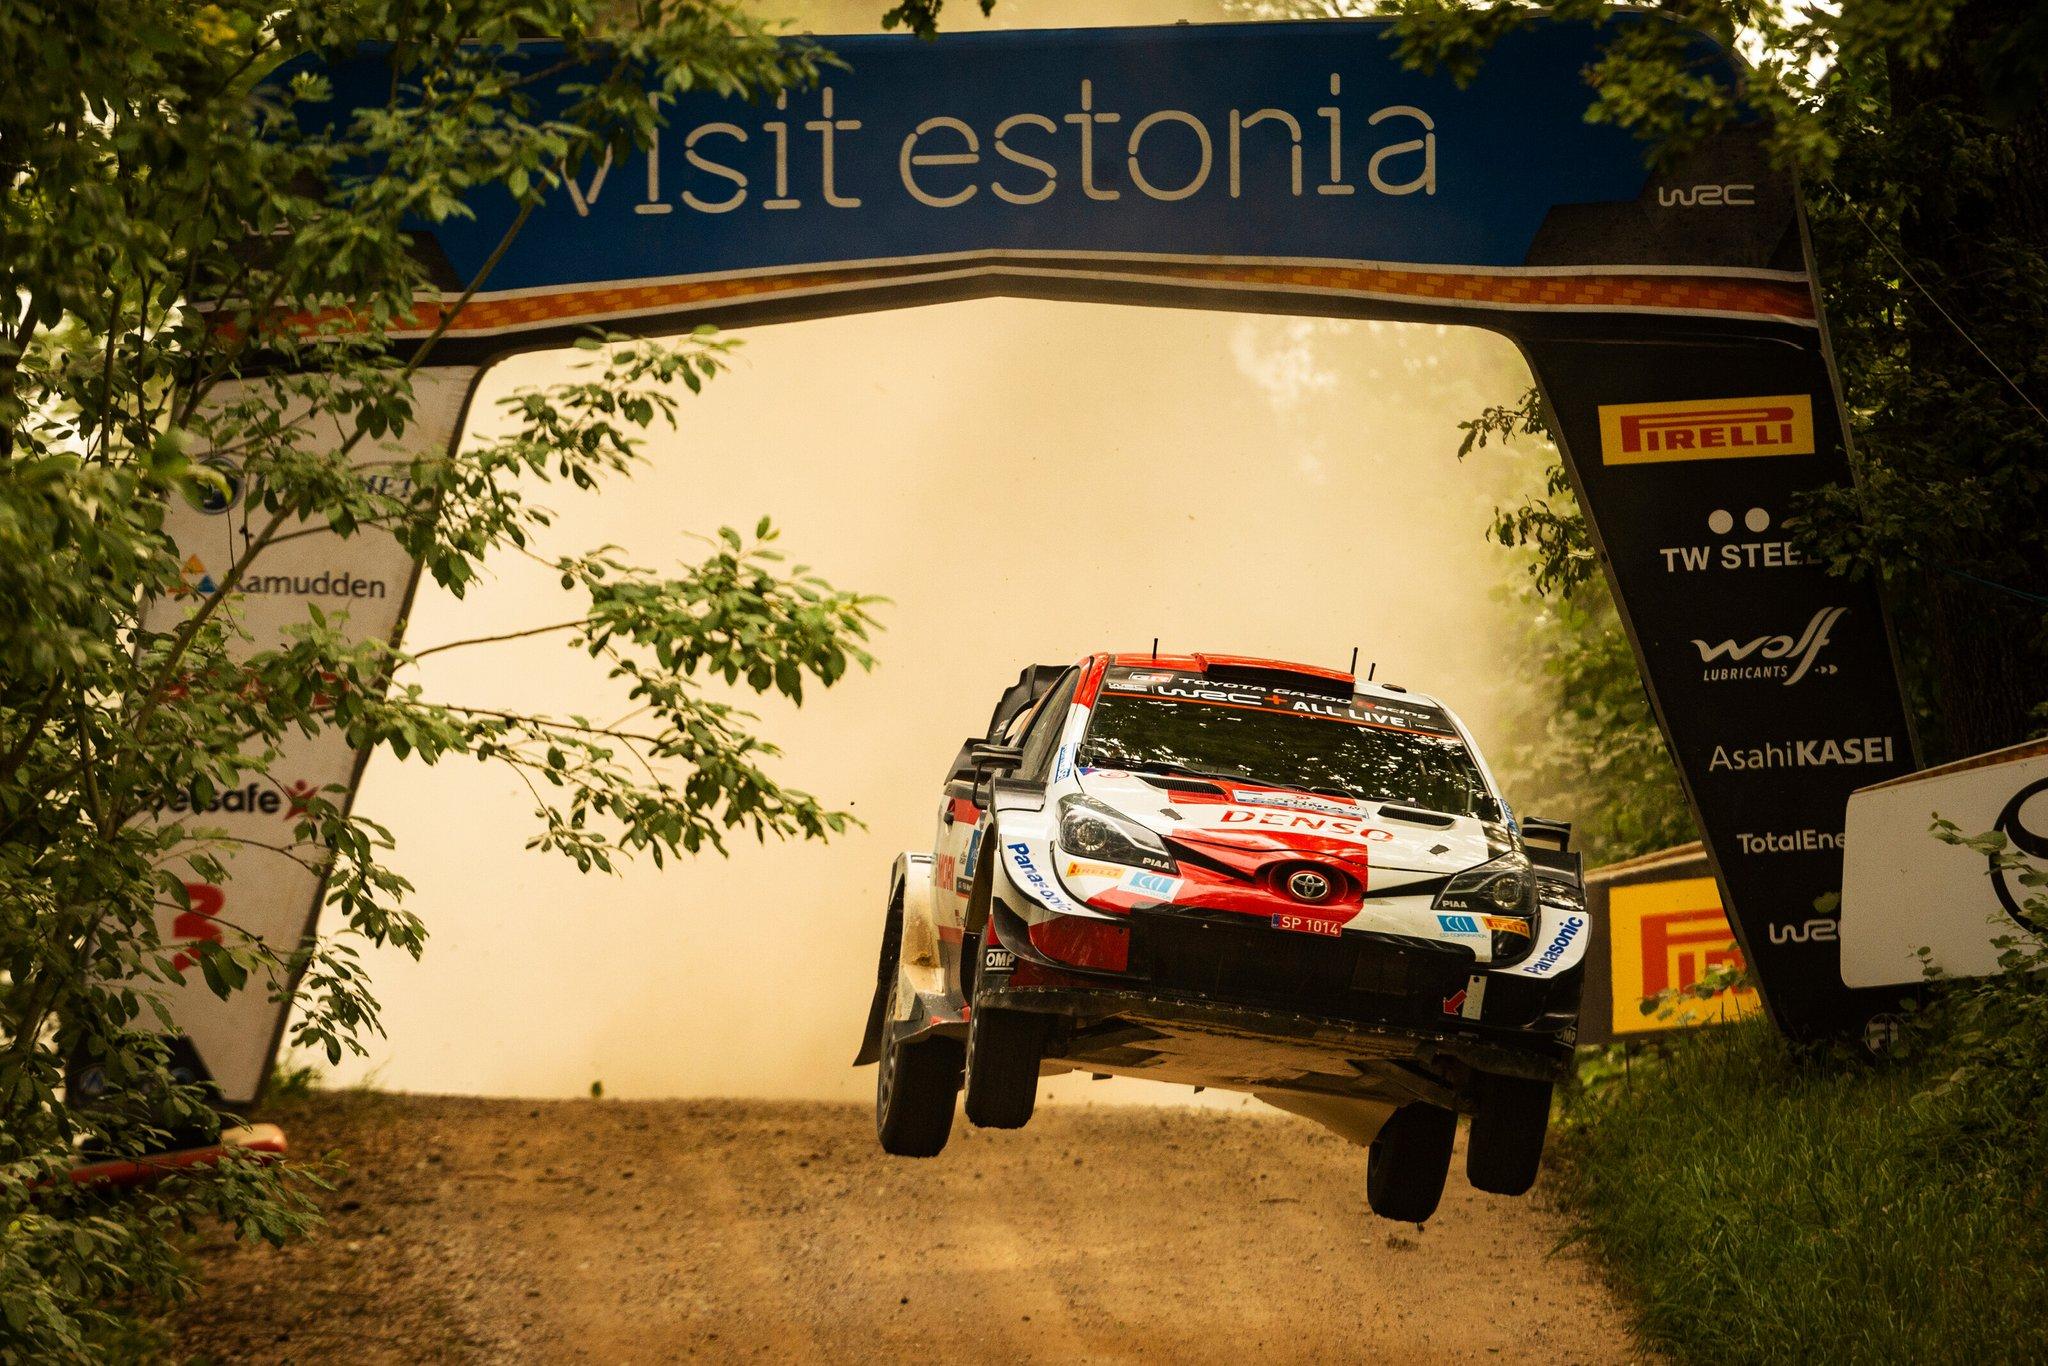 WRC: 11º Rally Estonia [15-18 Julio] - Página 3 E6k_Sh5XoAQsJDV?format=jpg&name=large